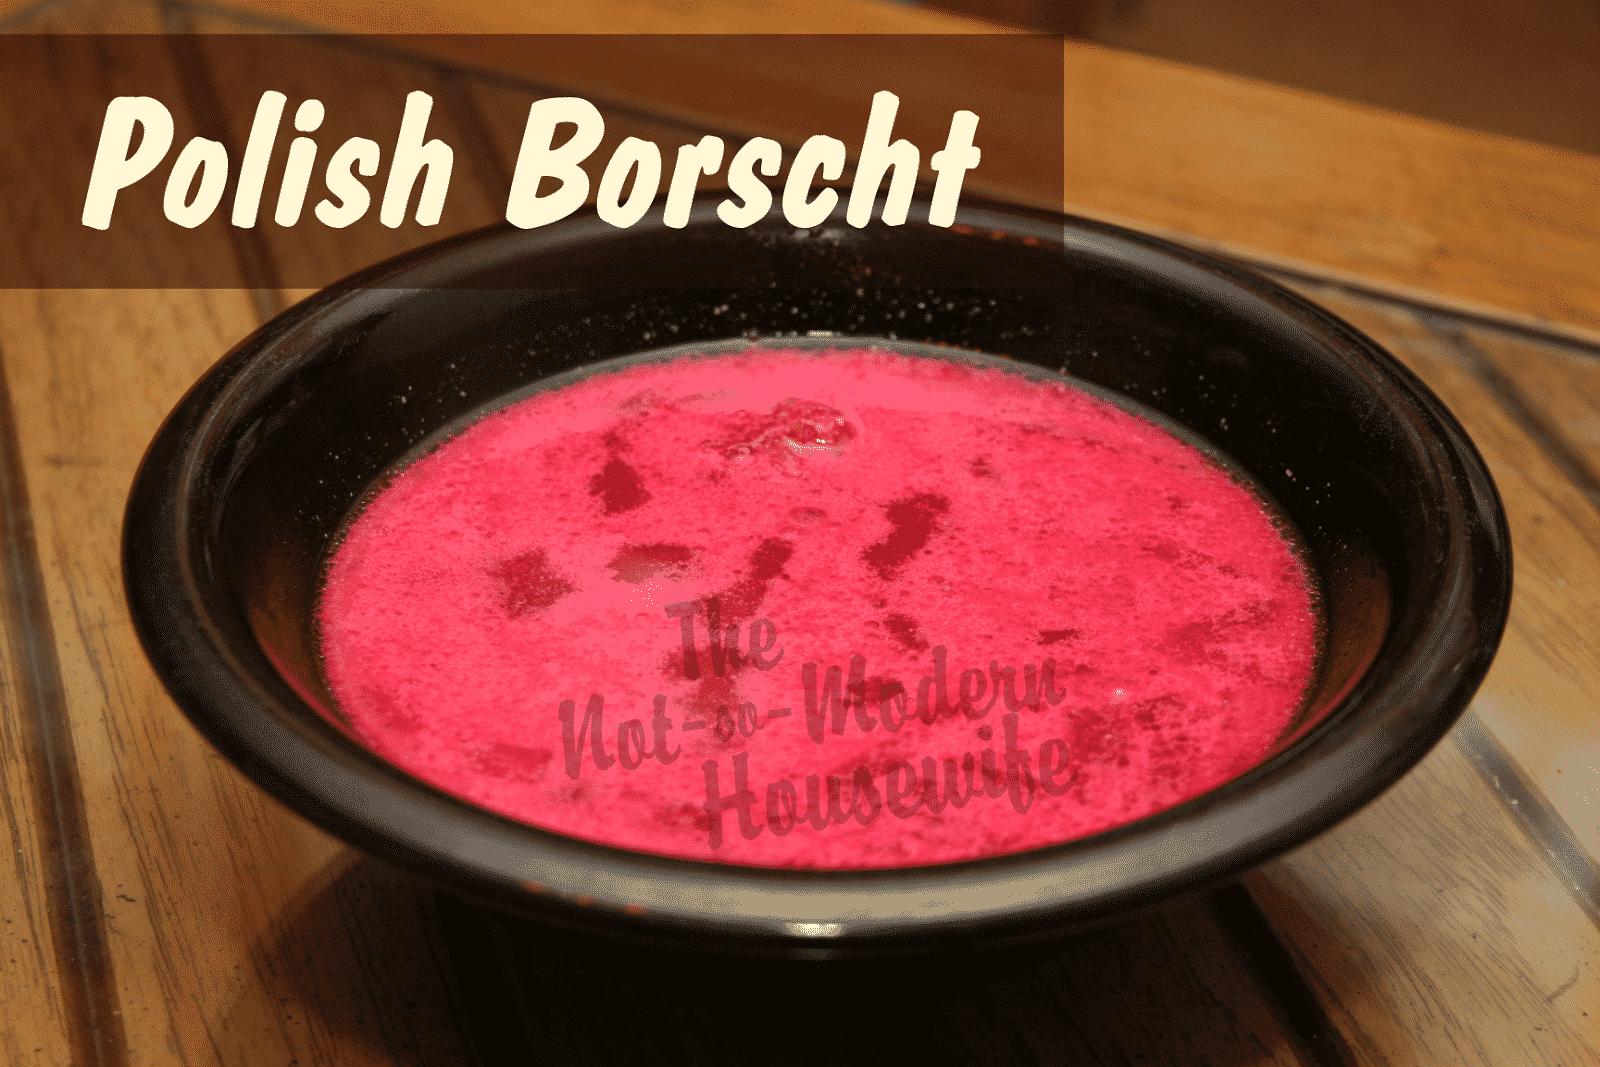 Polish Borscht - The Not So Modern Housewife